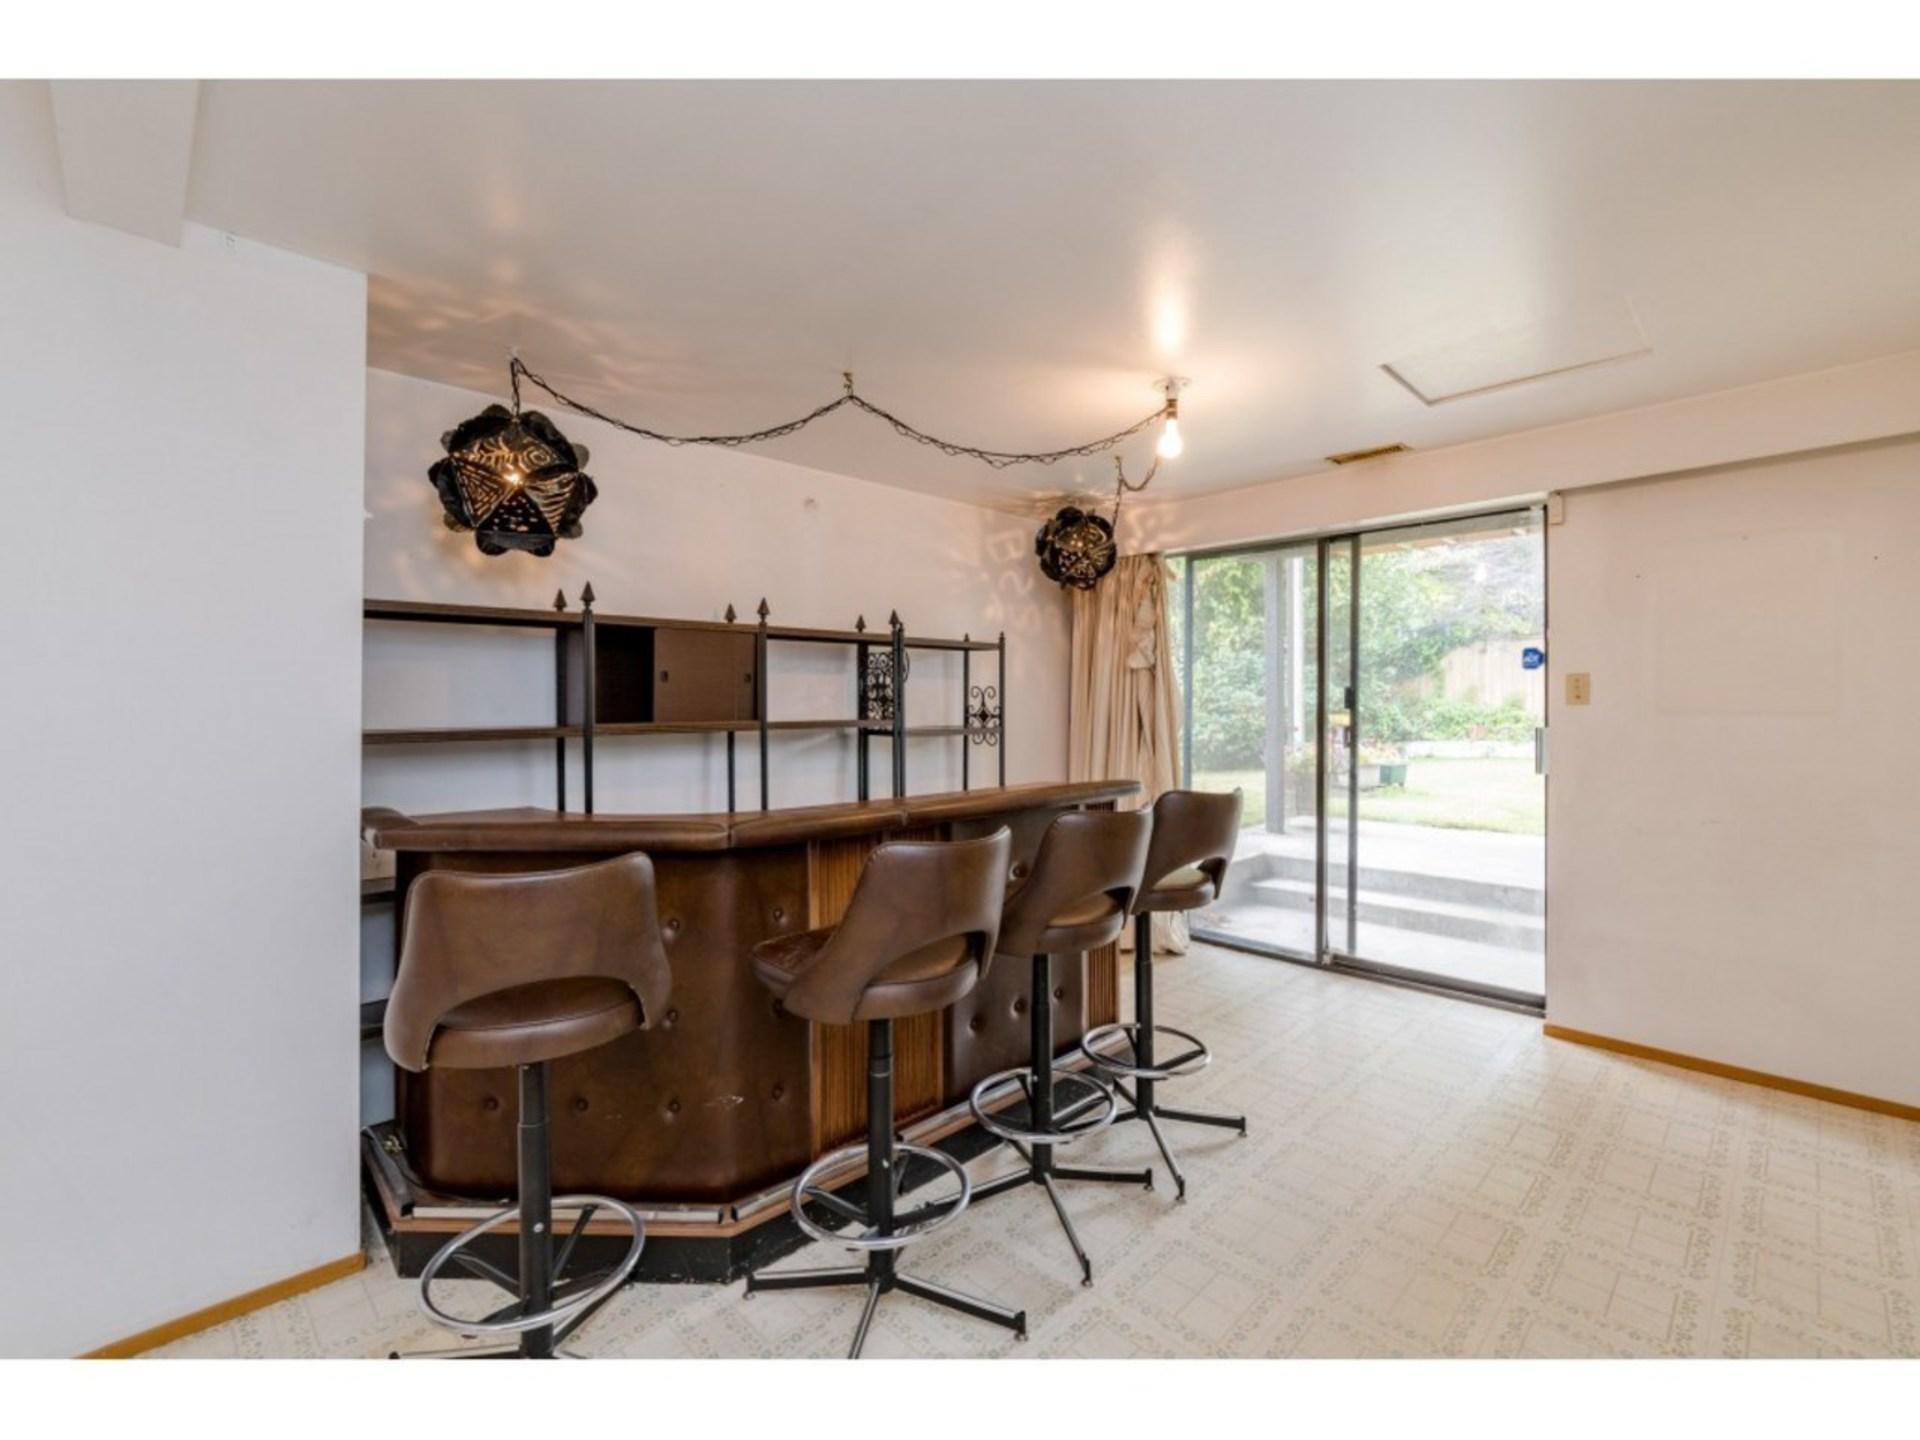 5771-172-street-cloverdale-bc-cloverdale-12 at 5771 172 Street, Cloverdale BC, Cloverdale